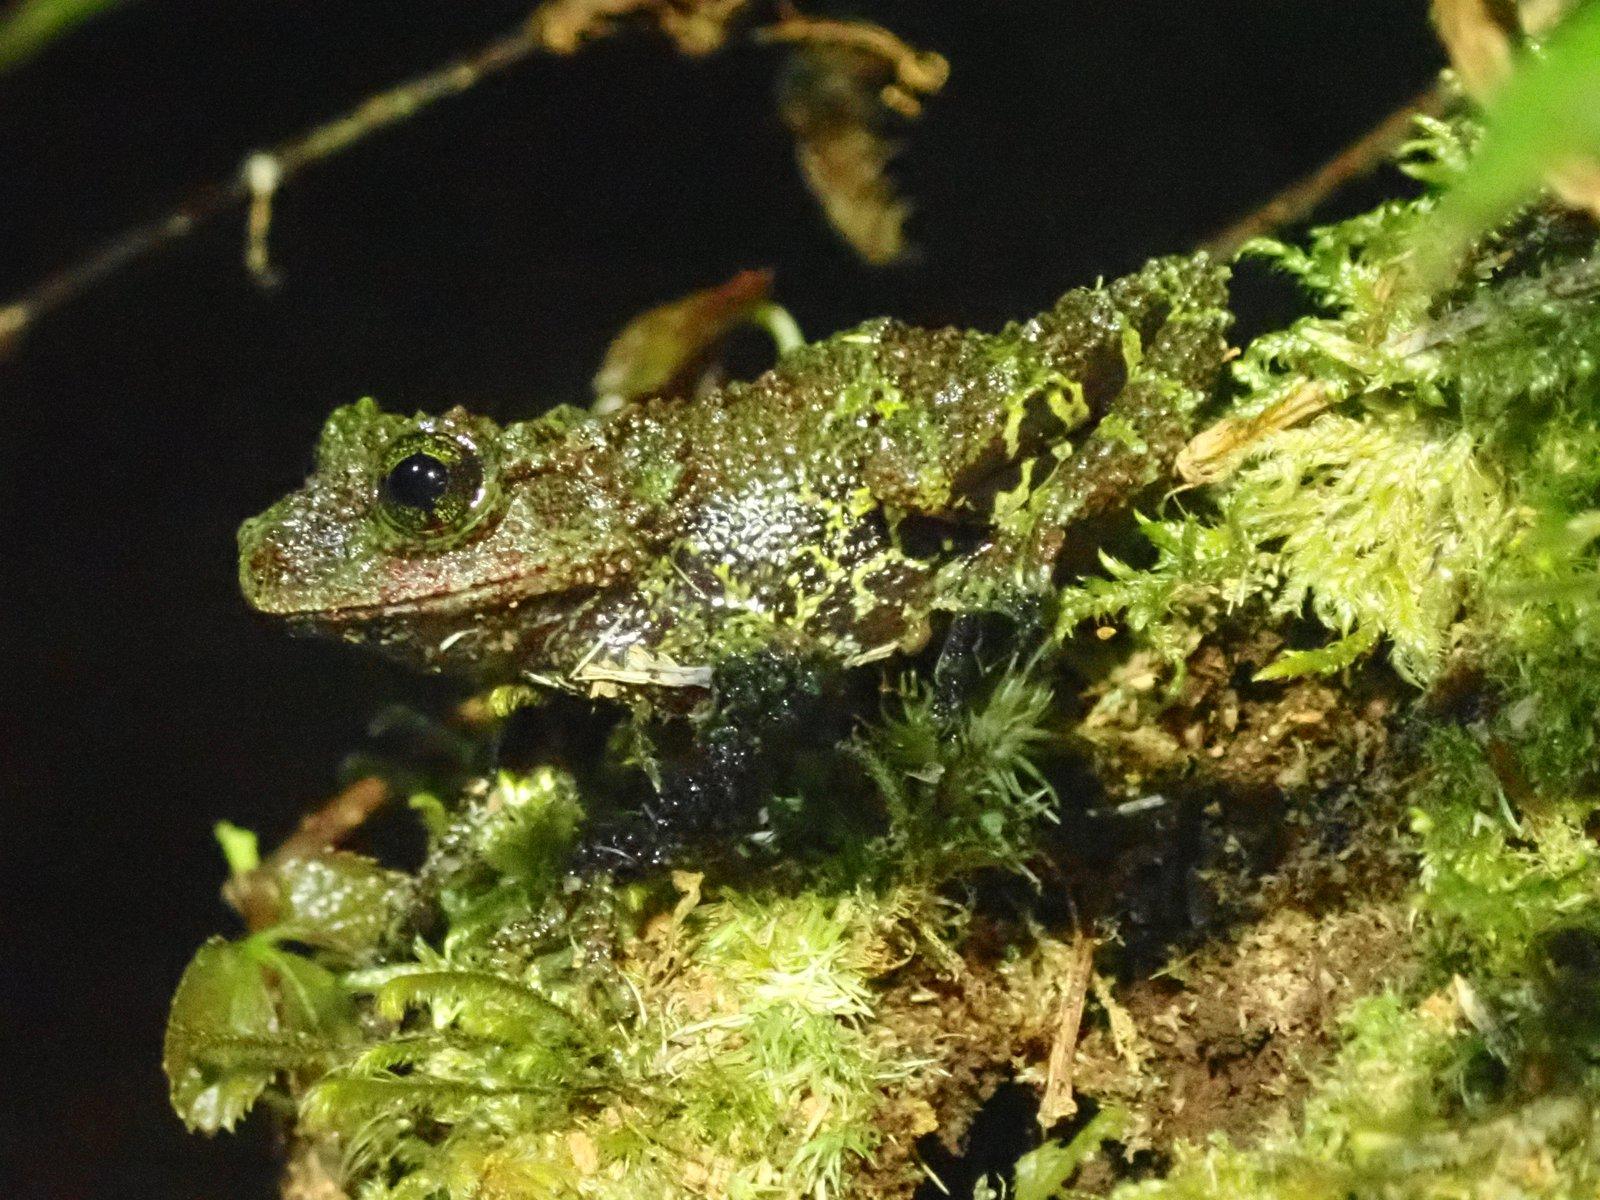 The Chapa Moss Frog